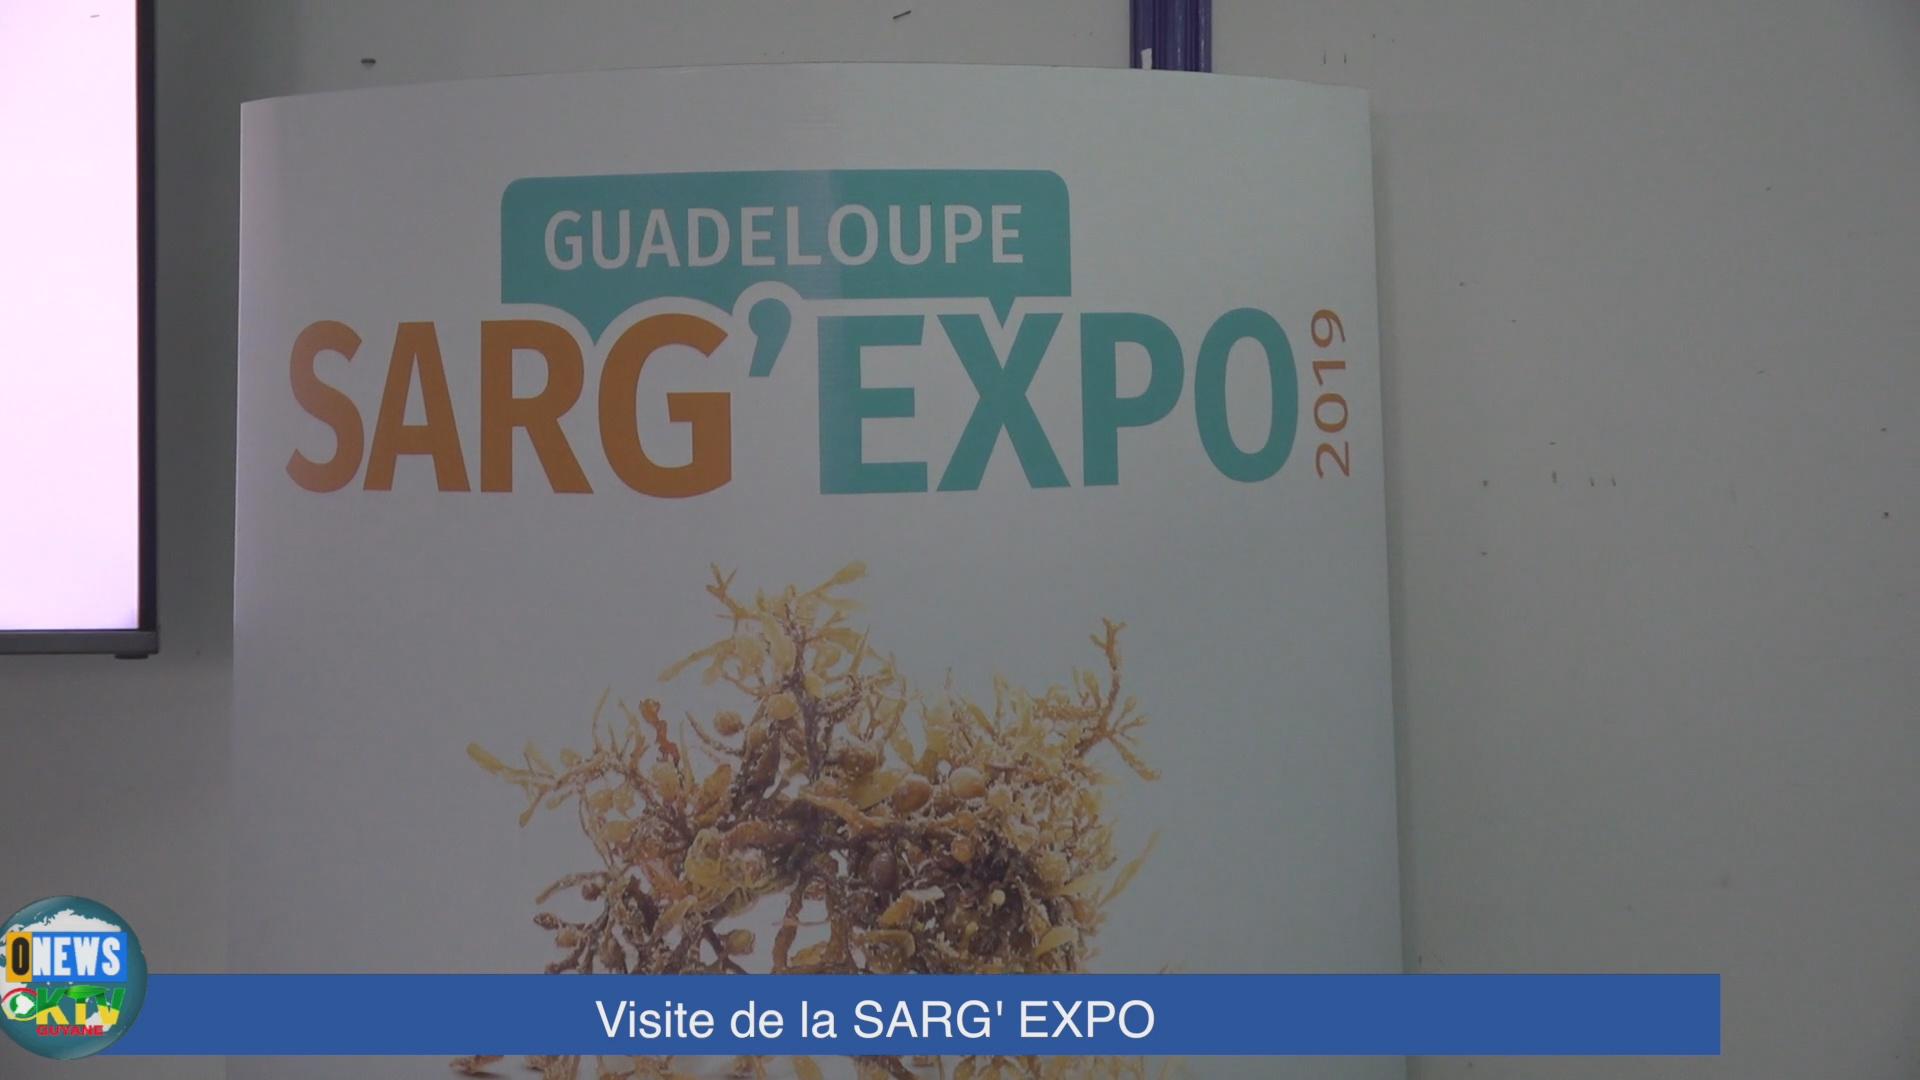 [Vidéo] GUADELOUPE. Salon Sarg' Expo